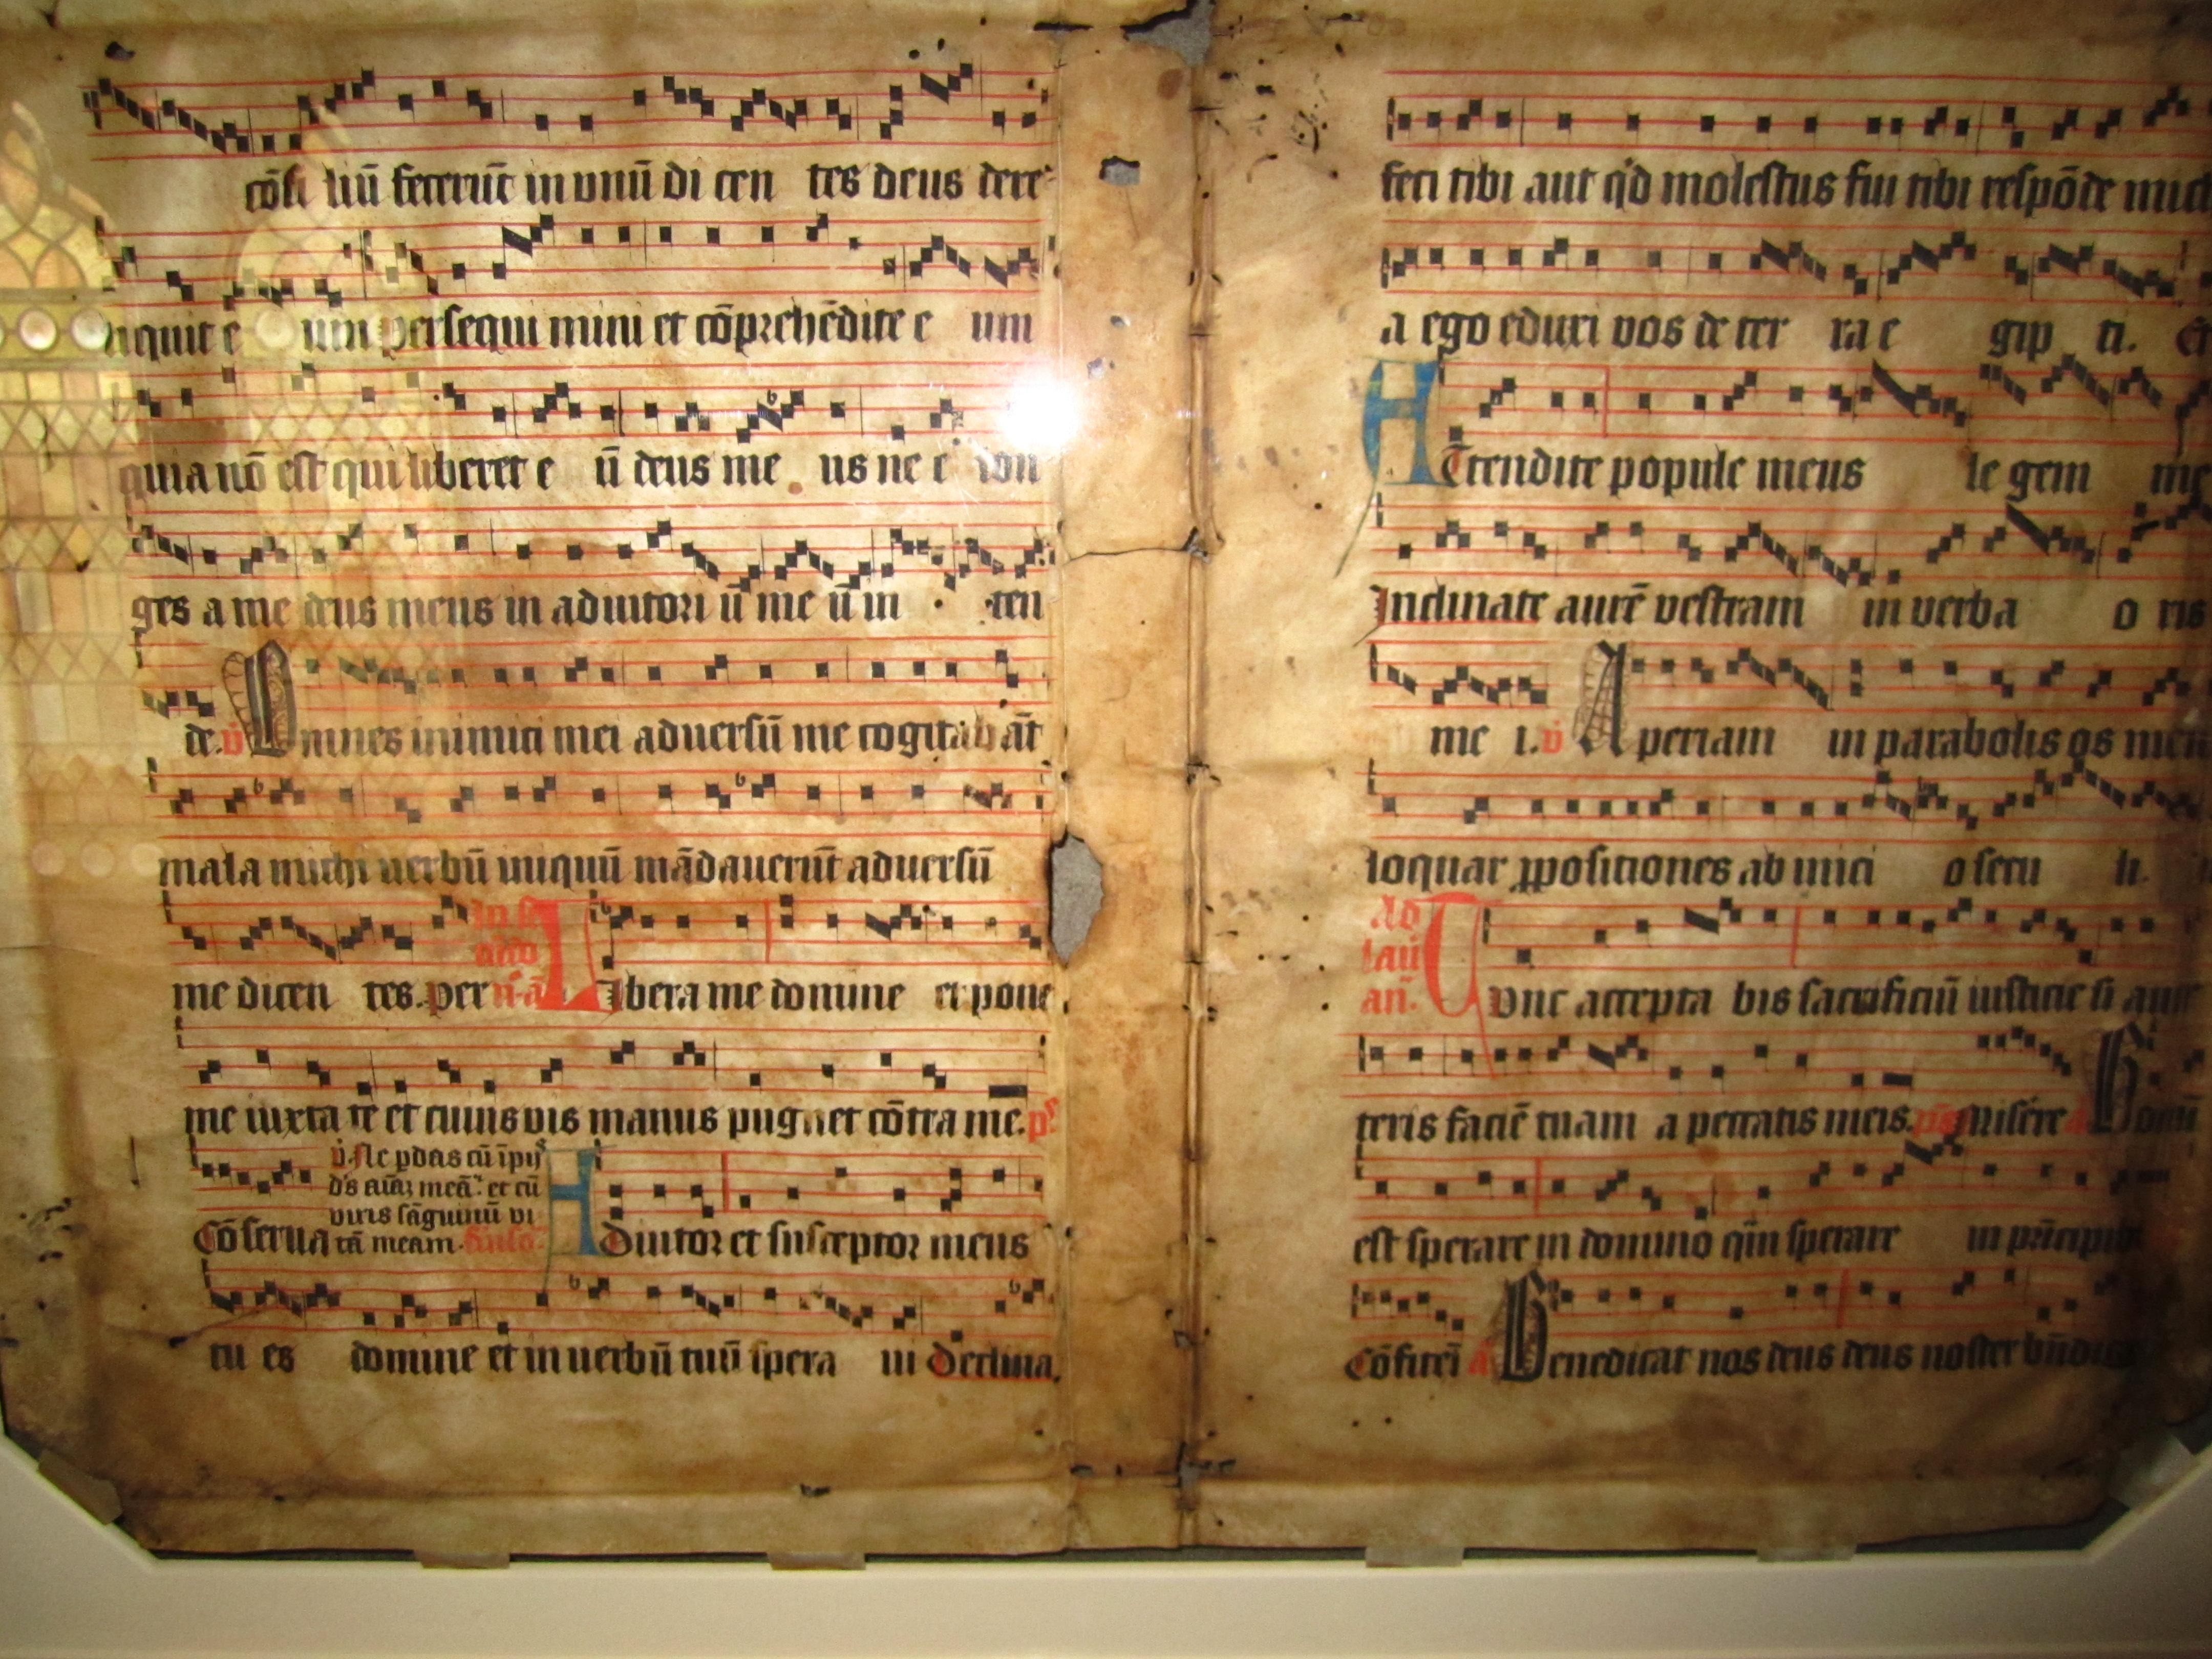 gregorian chant notes